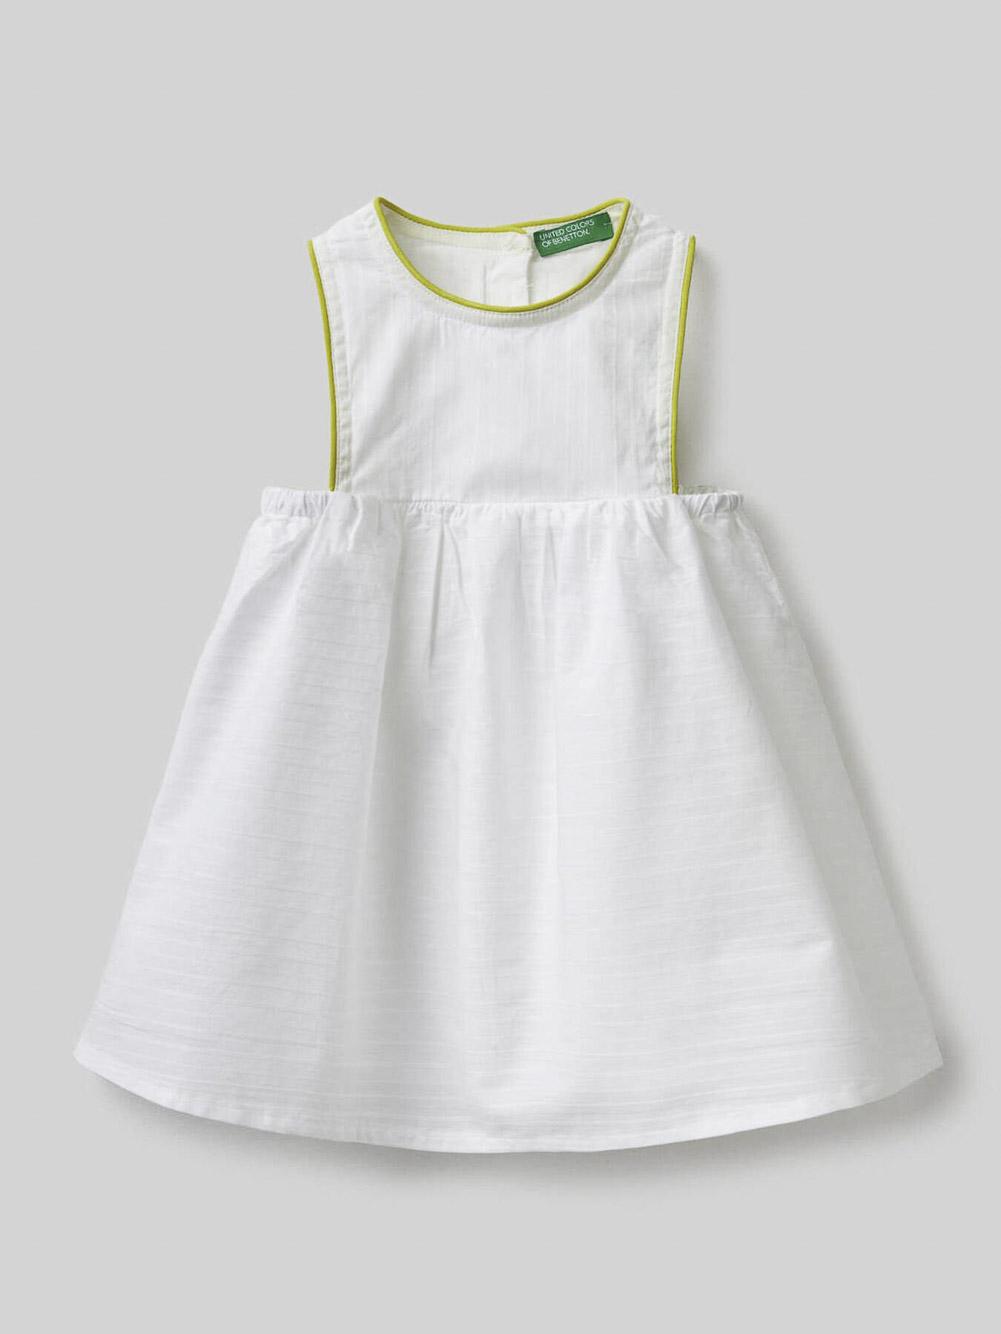 012 BENETTON Φόρεμα 44QB5VFX0 21P101